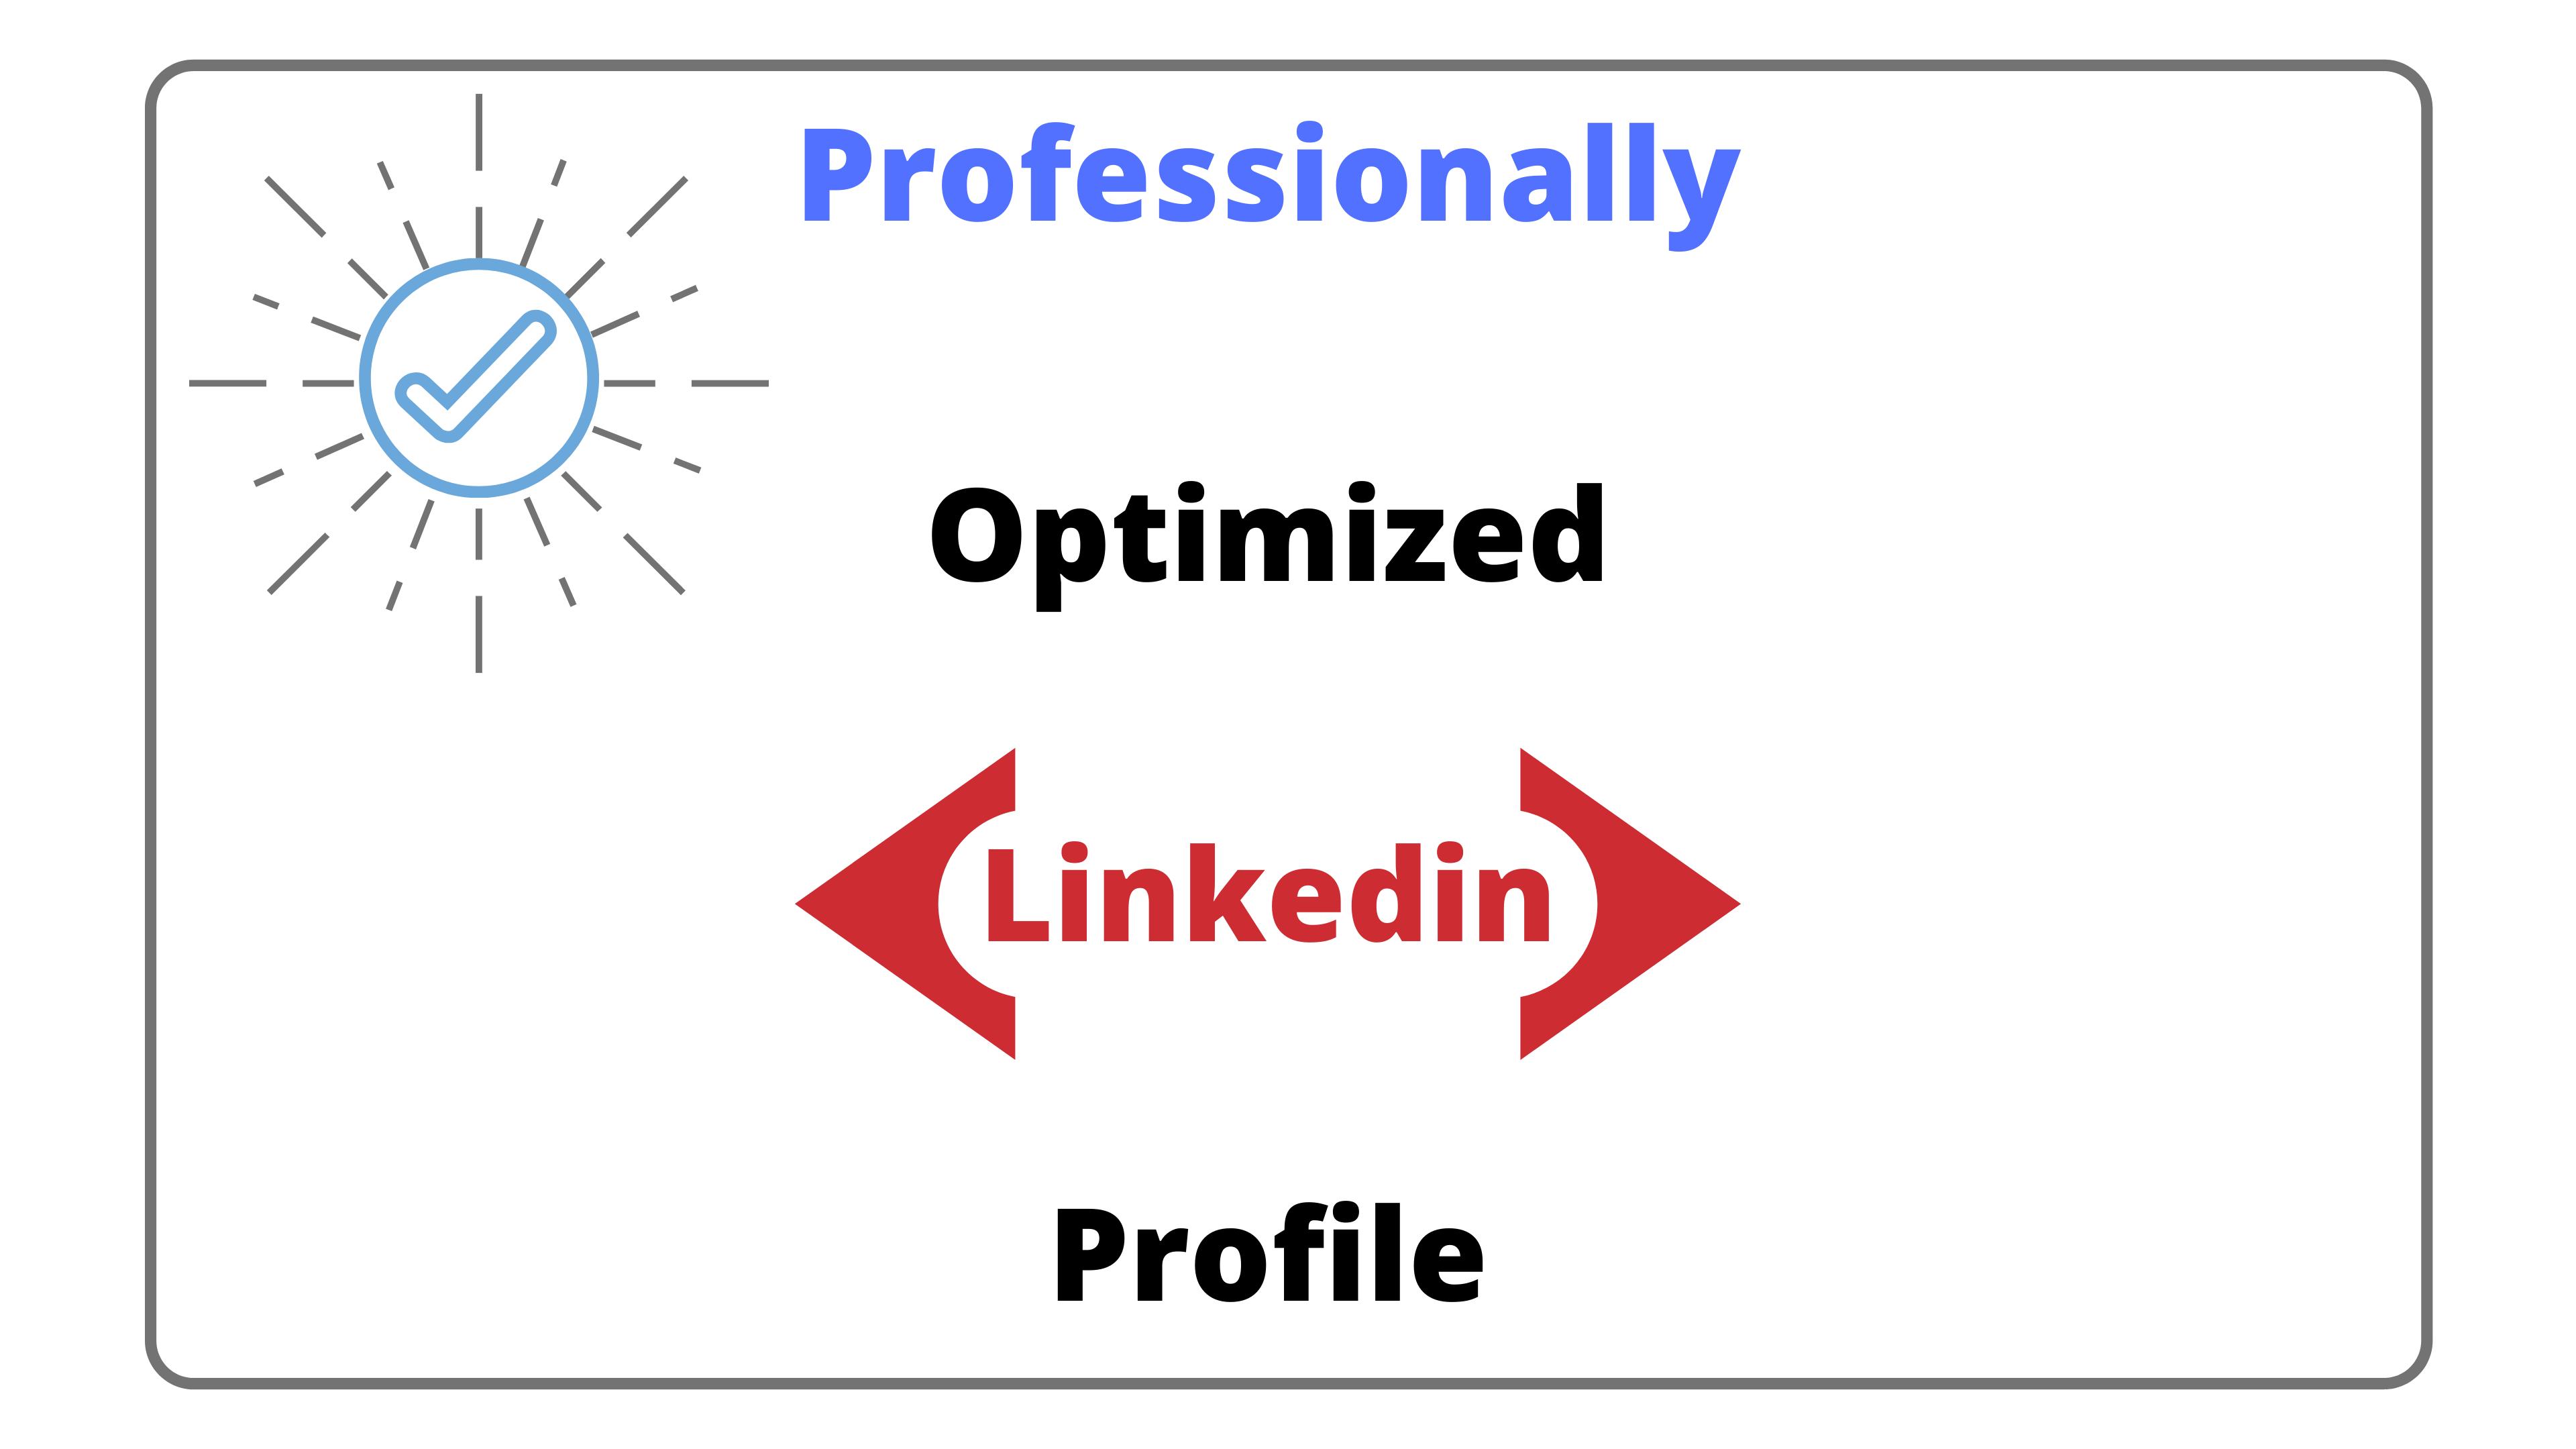 Professionally Optimized Linkedin Profile Grow Your Business Profile